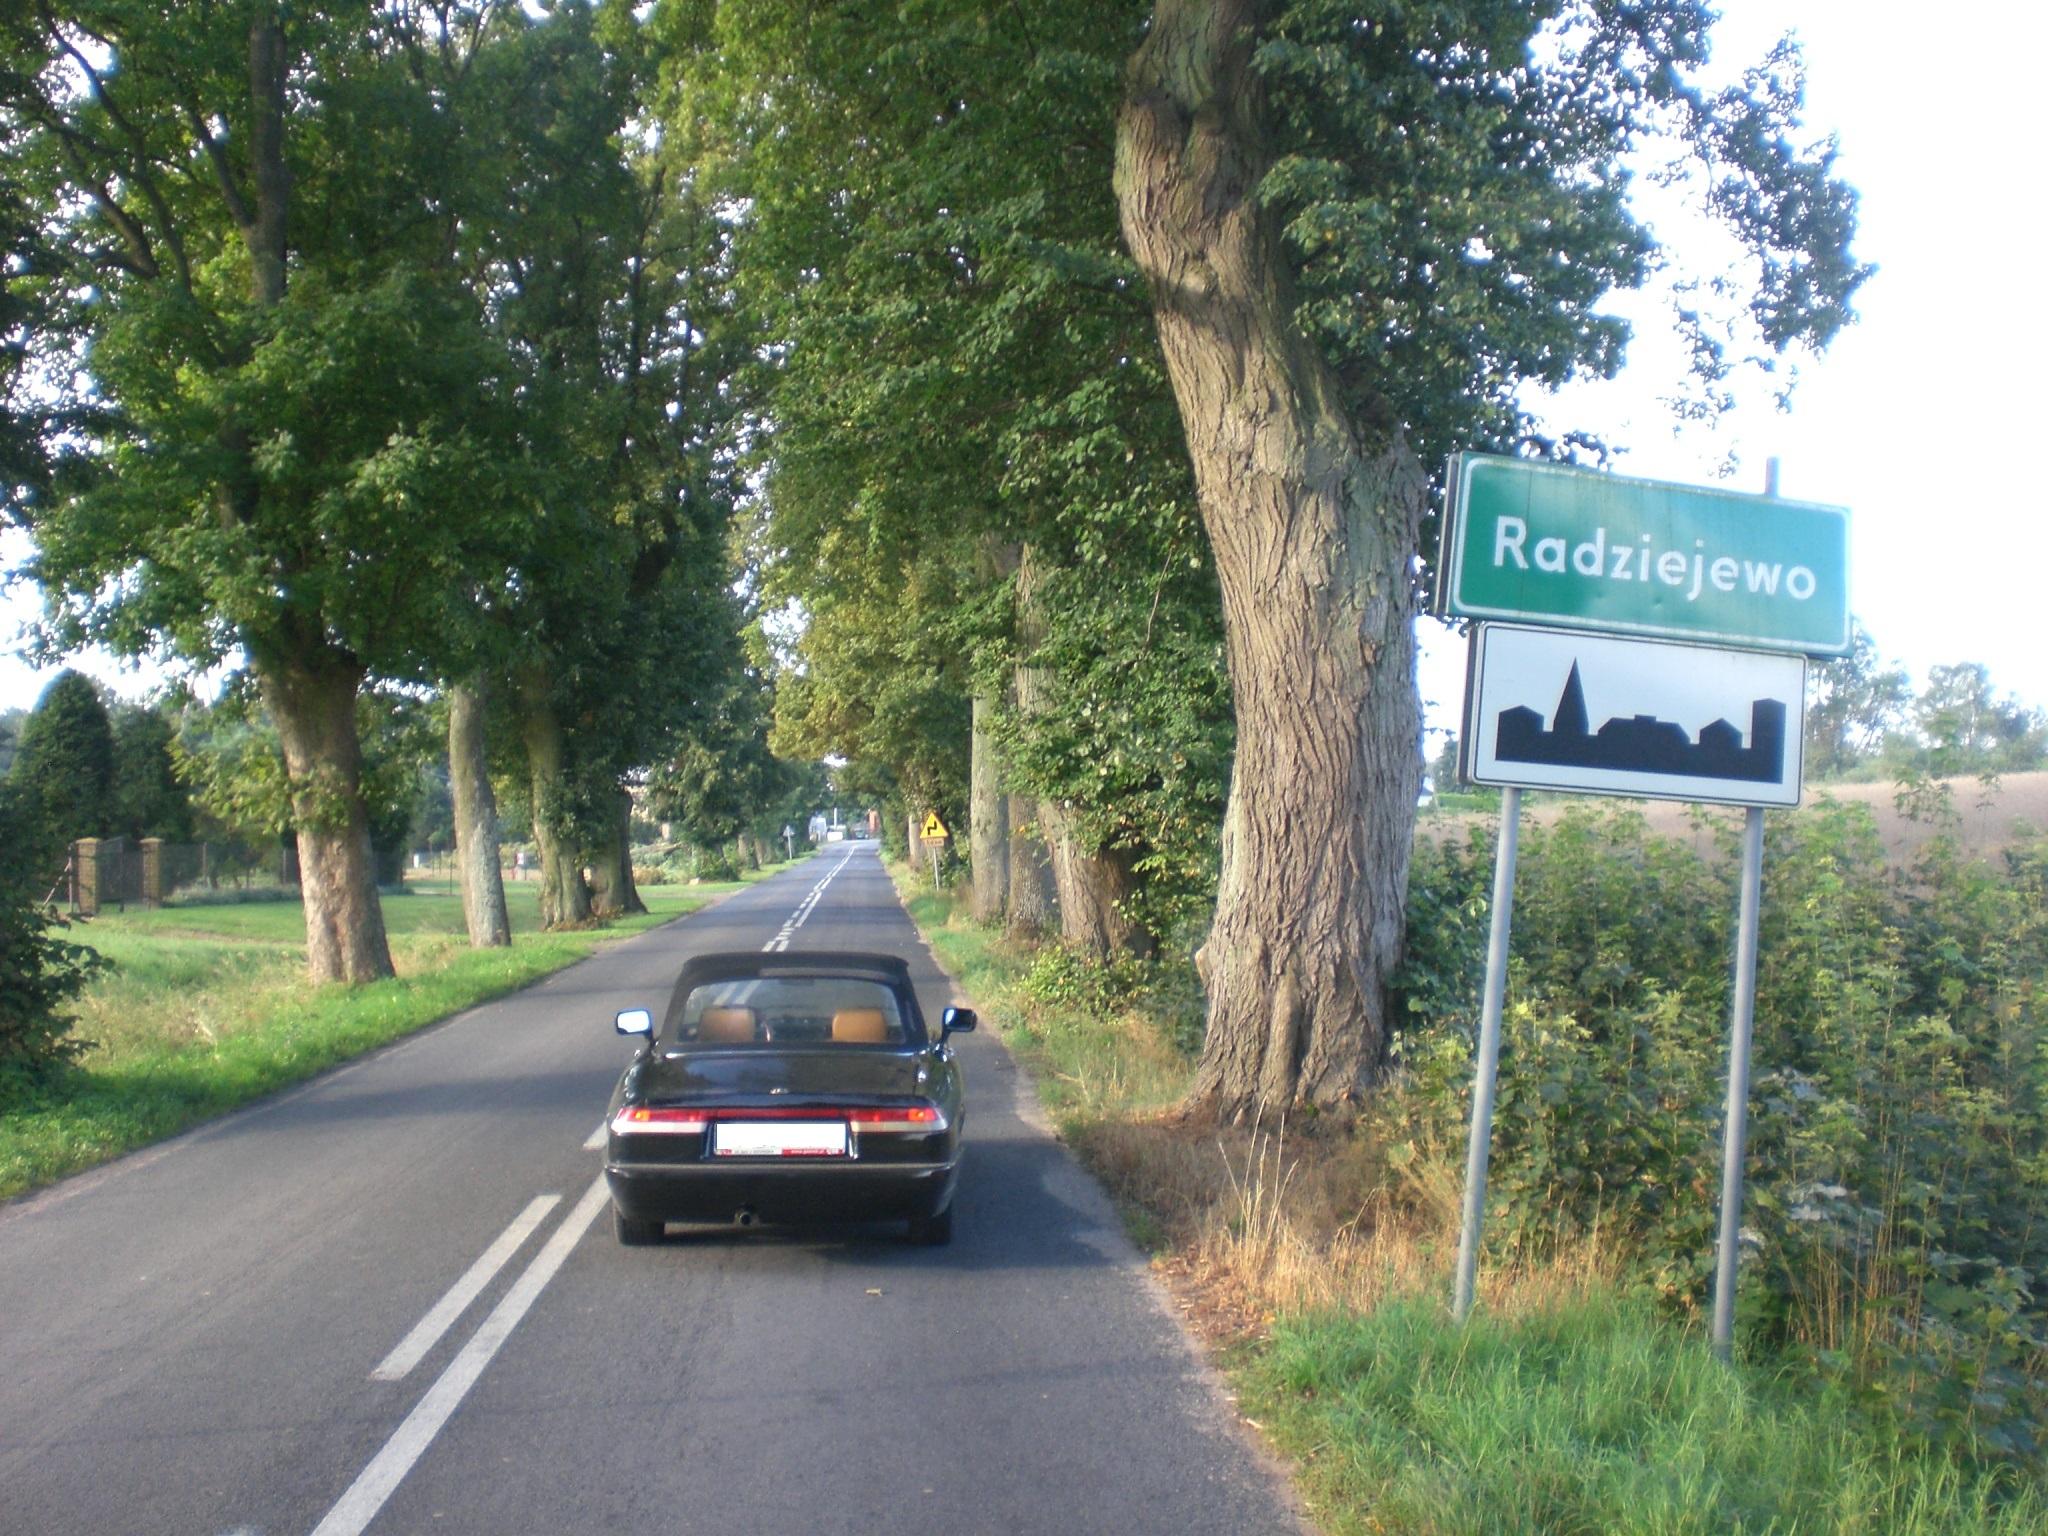 Radziejewo_3774.jpg